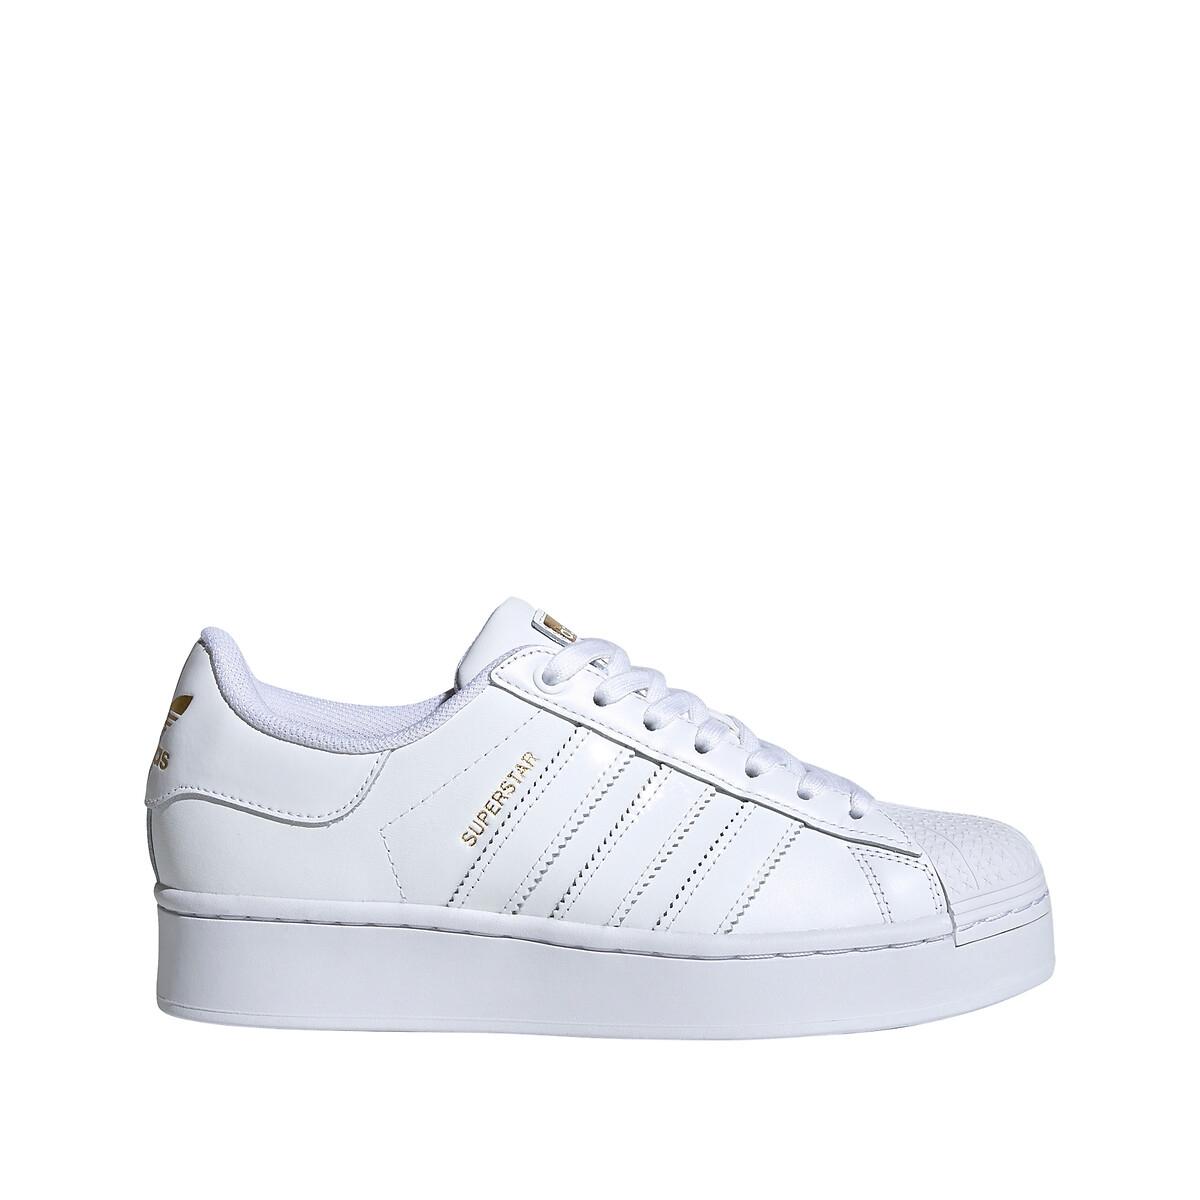 Adidas Originals Superstar Bold Dames Cloud White / Cloud White / Gold Metallic Dames online kopen